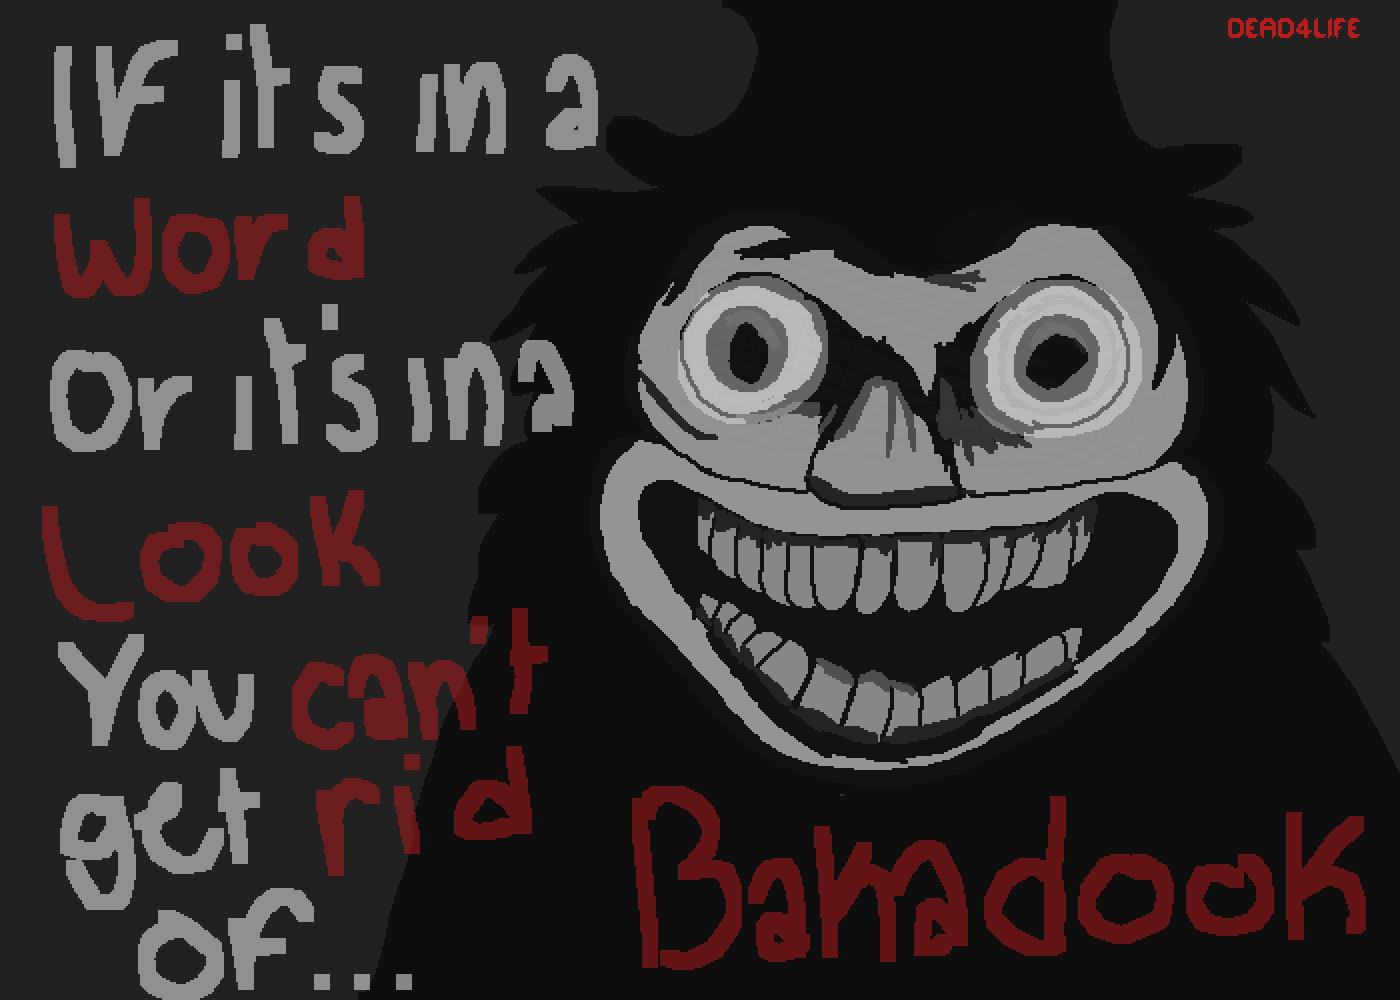 Bakadook